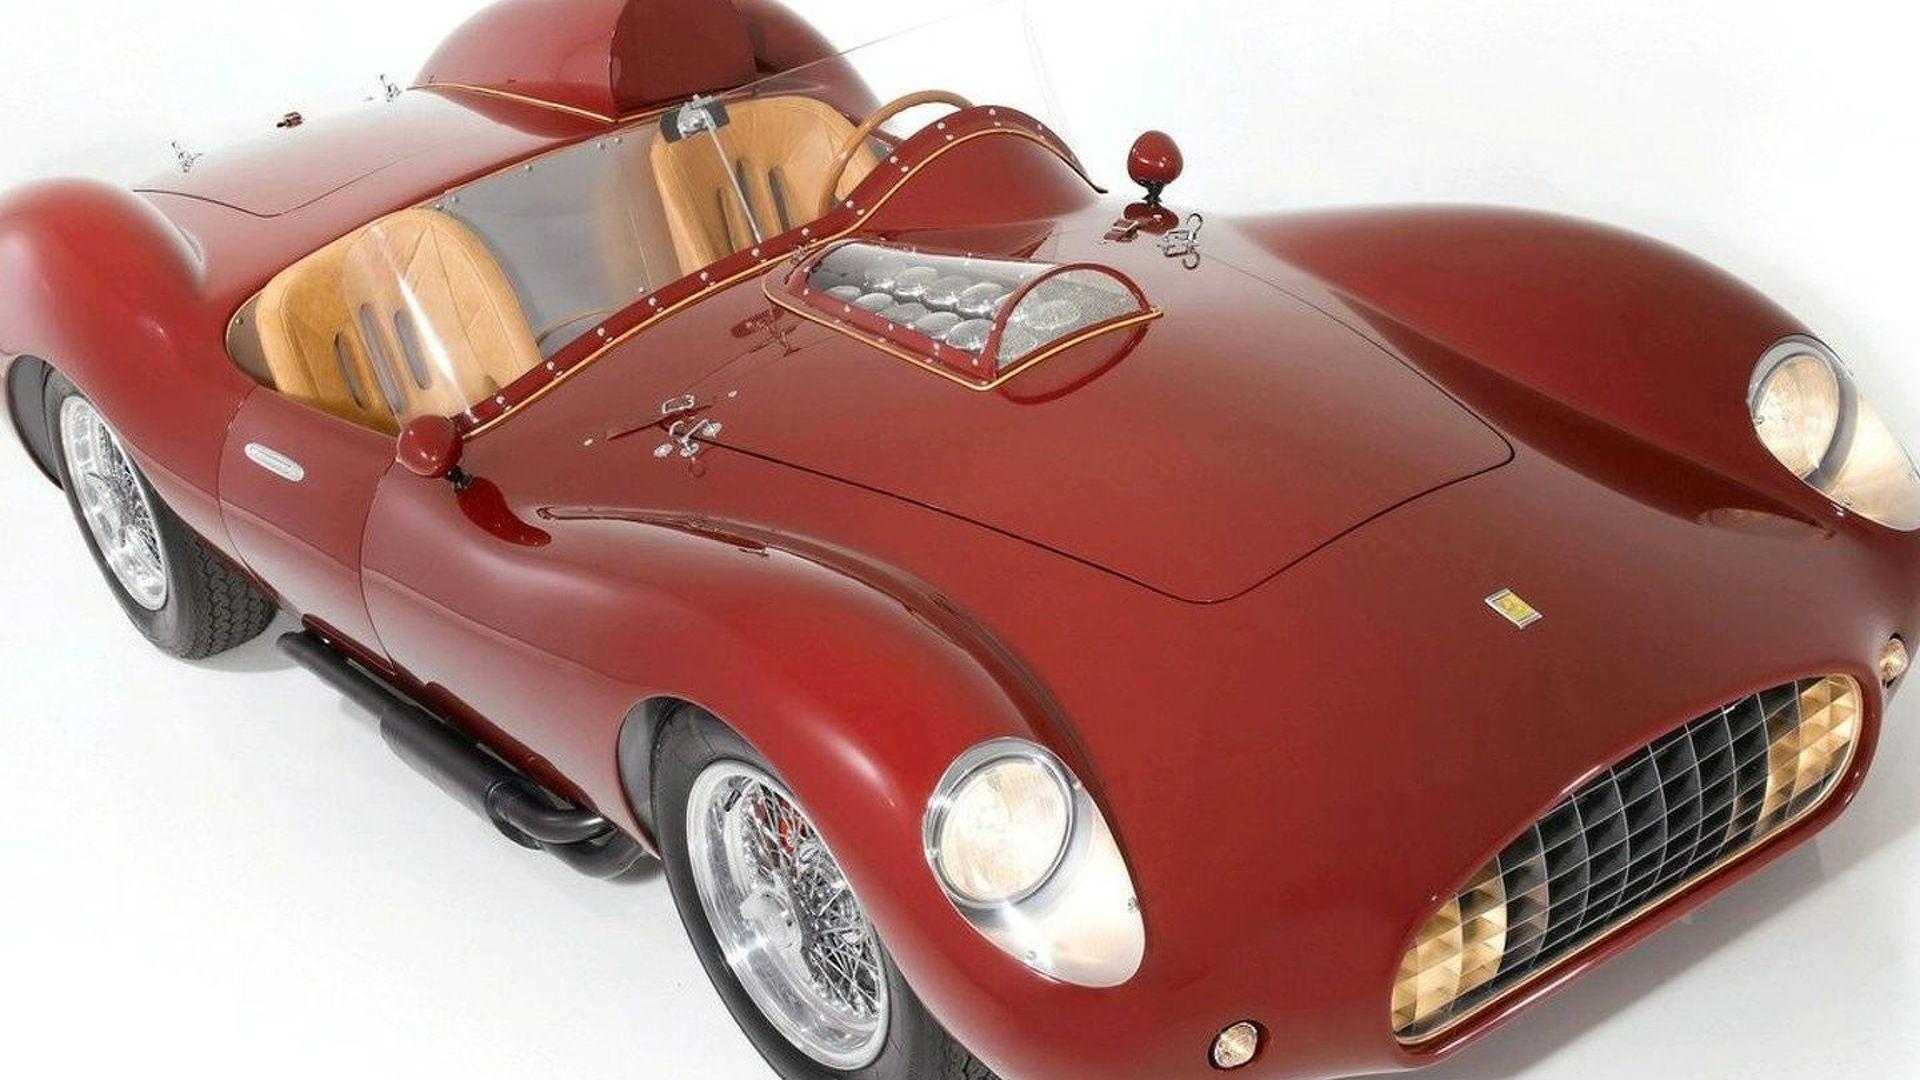 Creative Workshop Sport Speciale: a Real Nostalgic Car